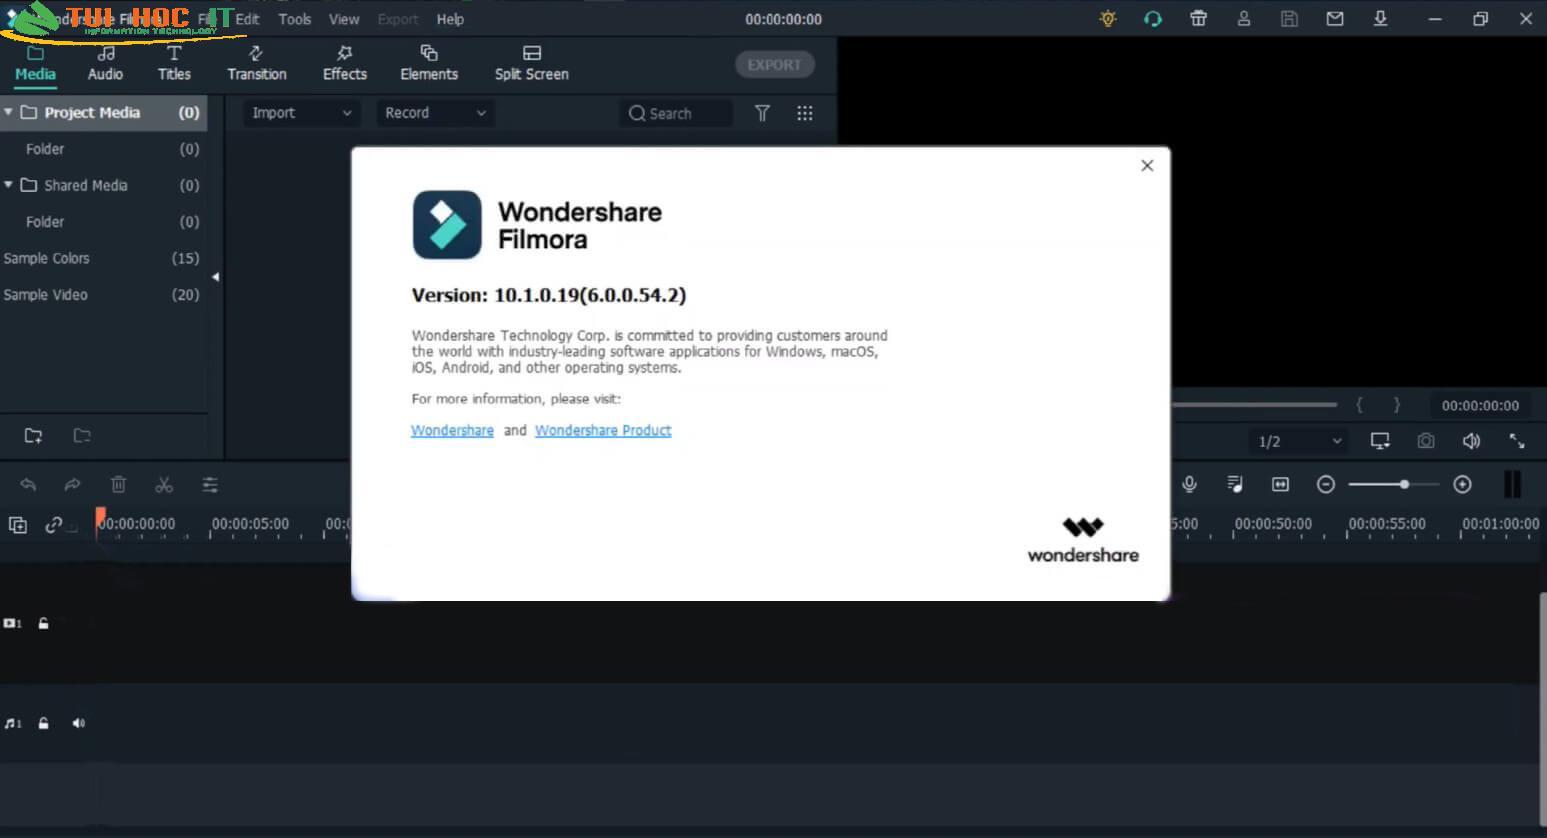 Tải Wondershare Filmora X Full Vĩnh Viễn 2021-Bản RePack 24